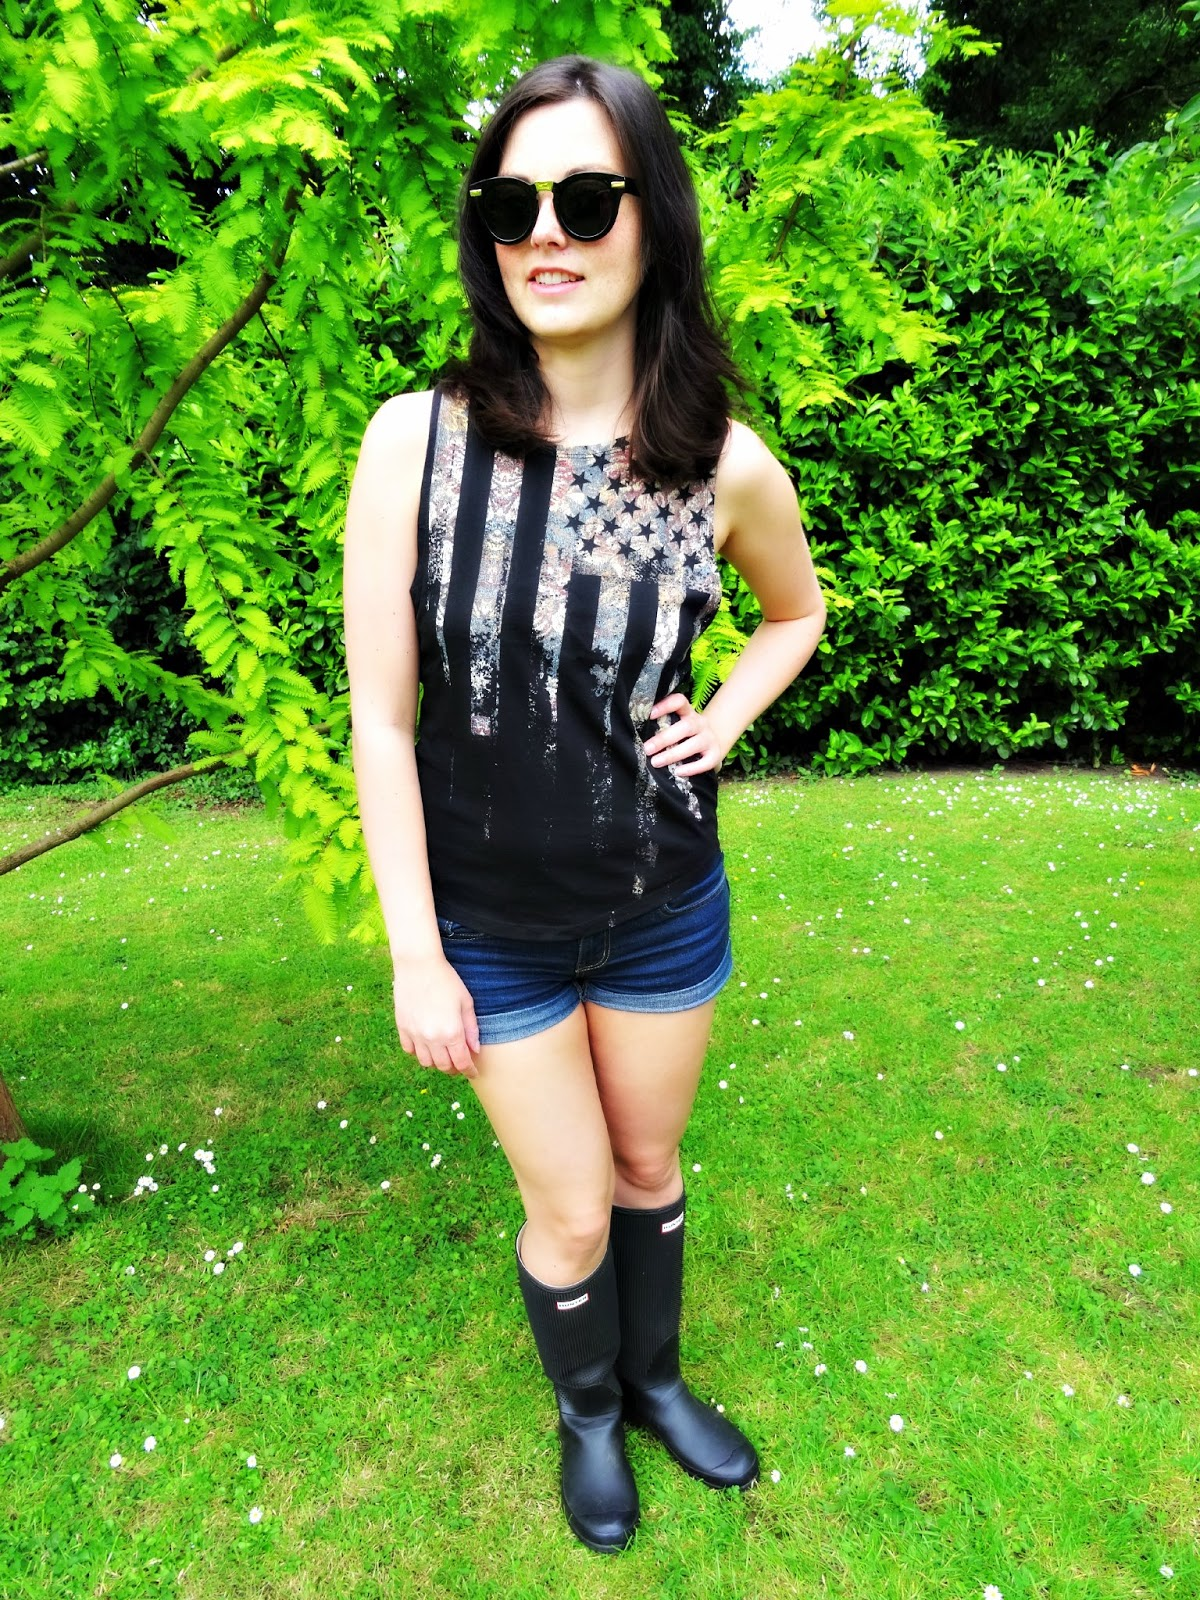 Glastonbury festival outfit